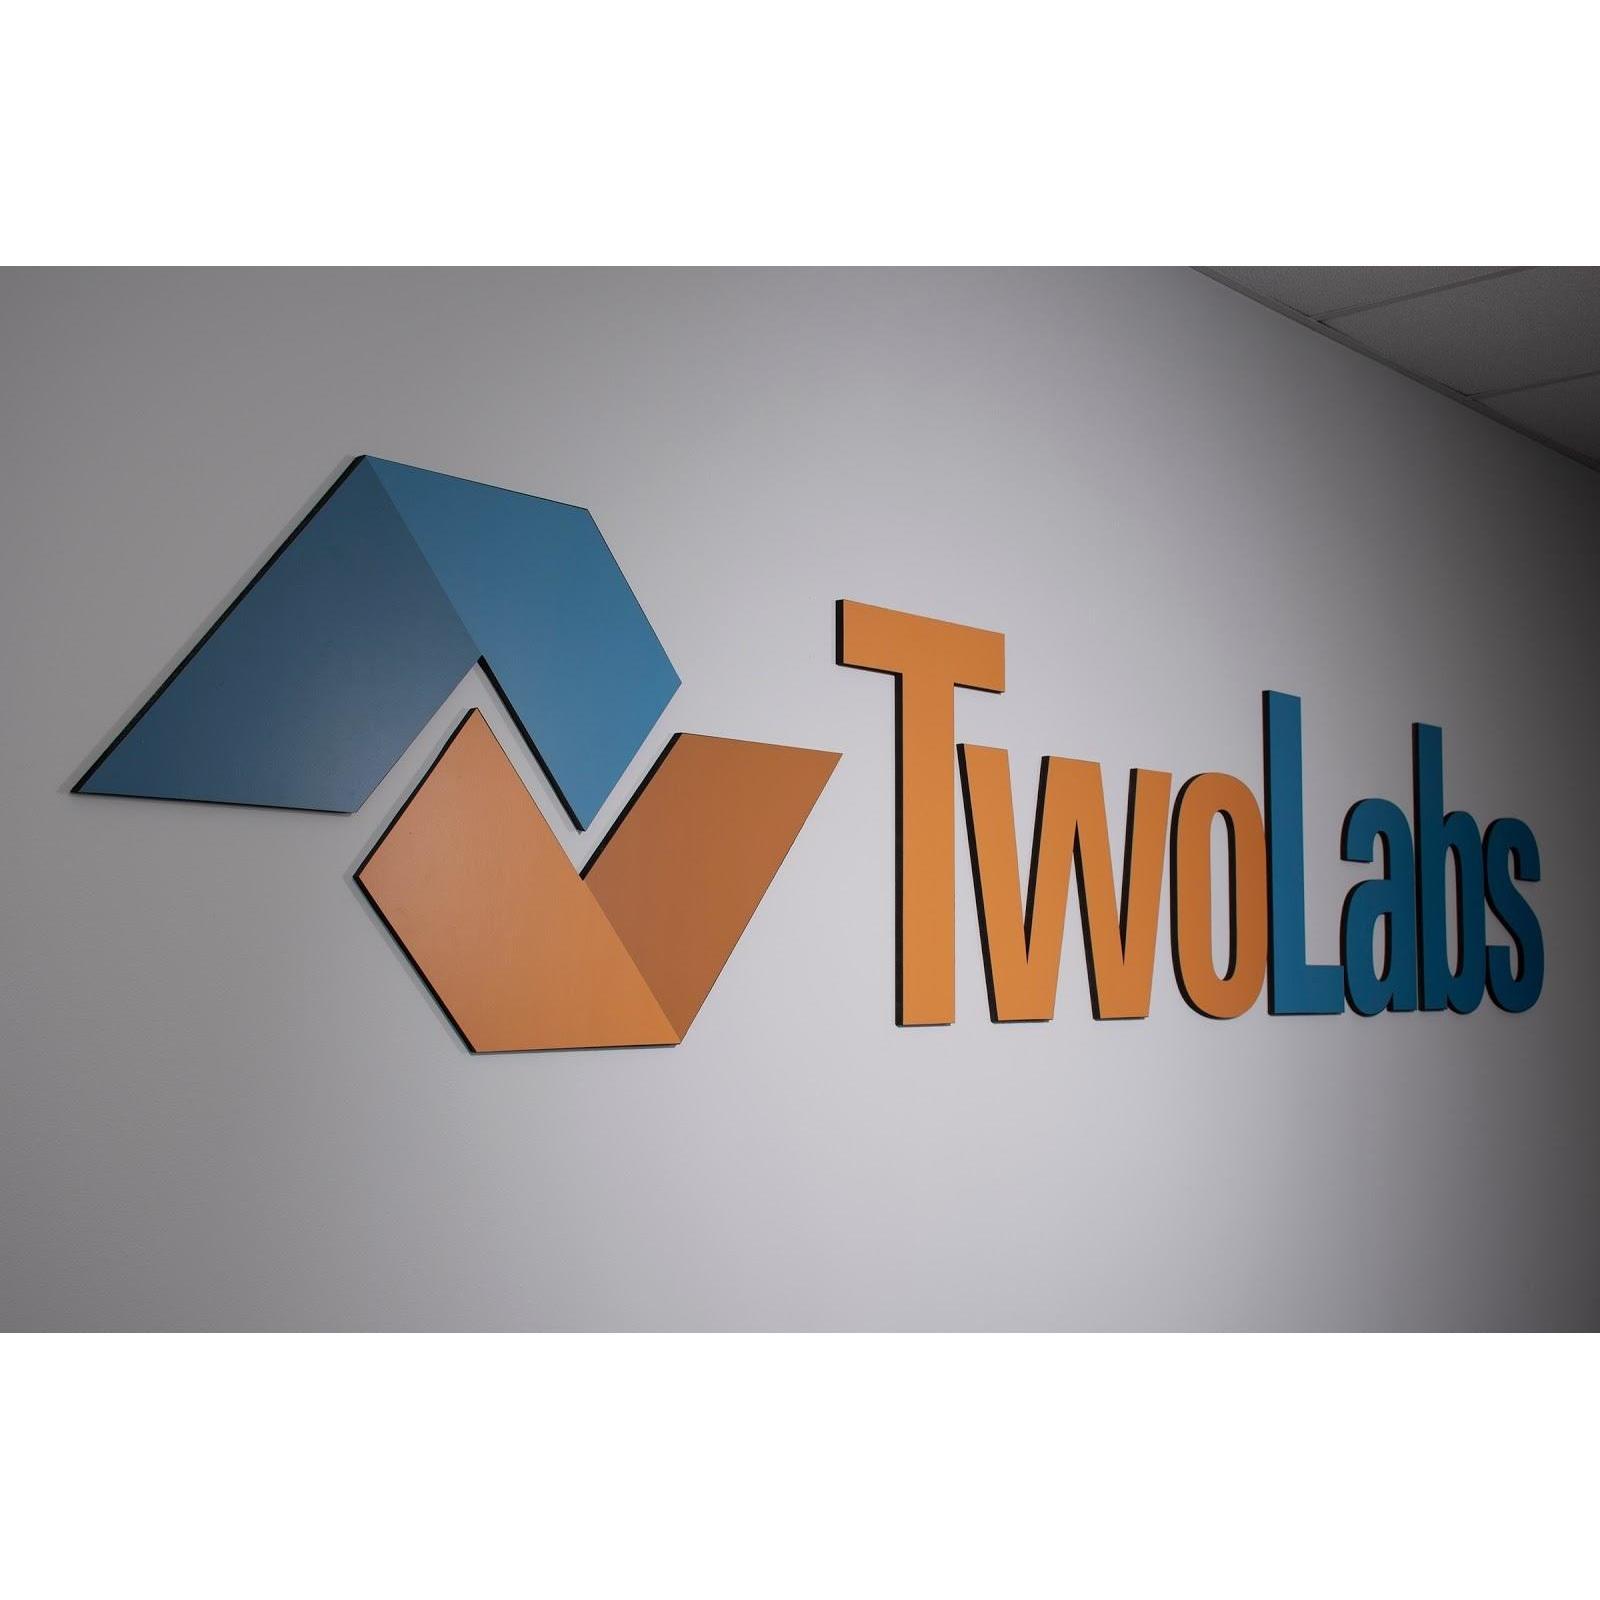 Two Labs, LLC